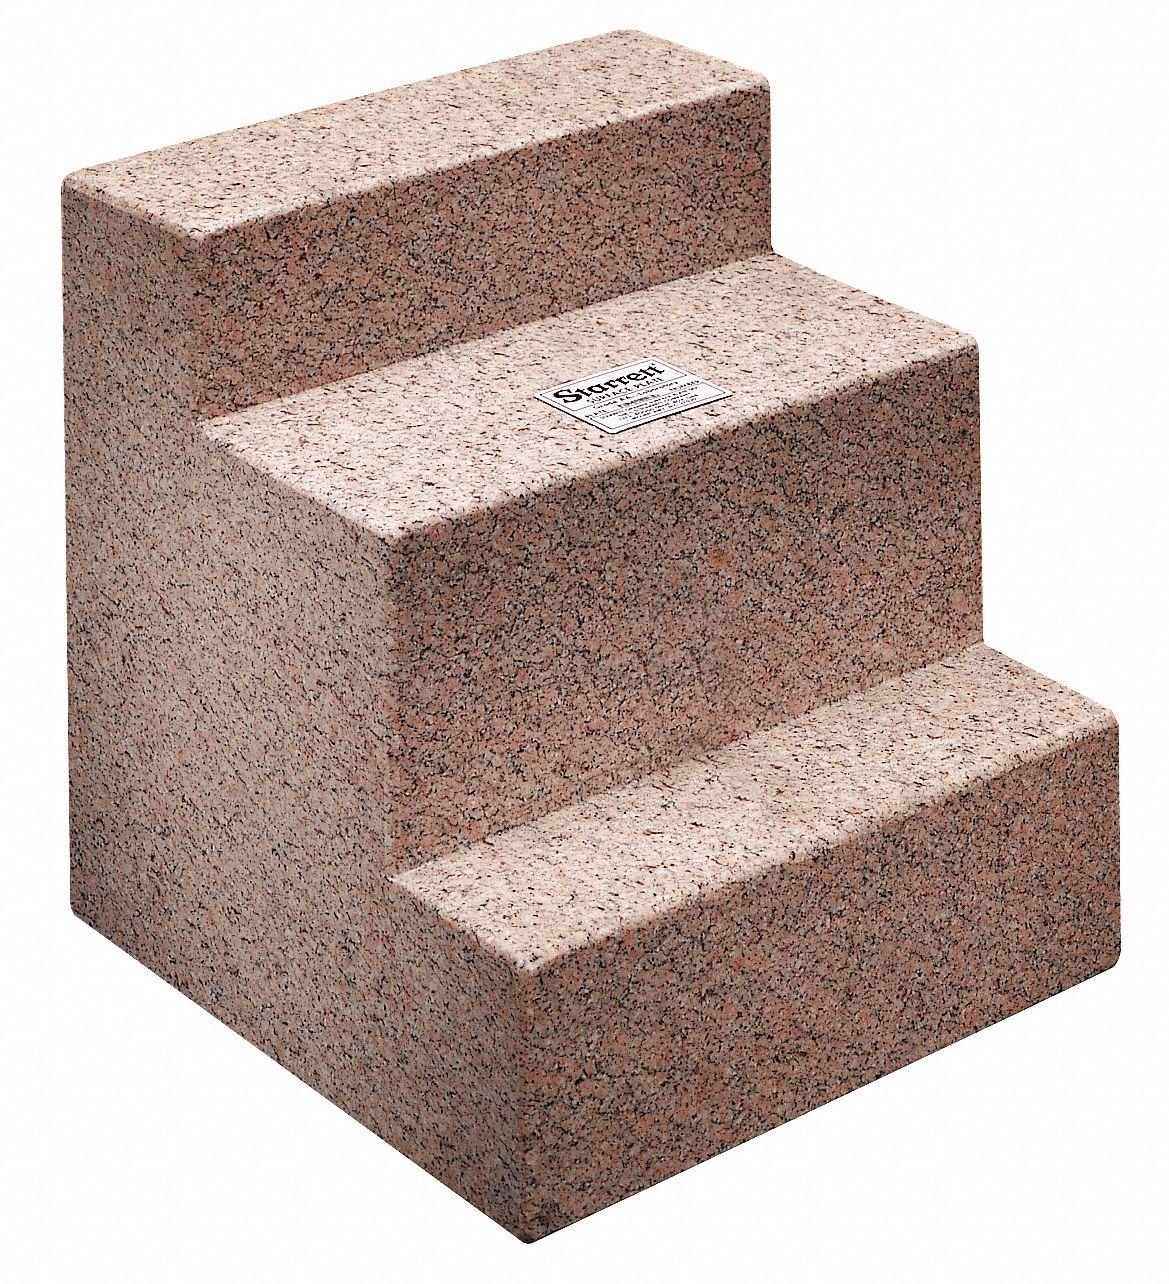 Granite Blocks Instrument : Starrett granite angle plate pink face a x pdg